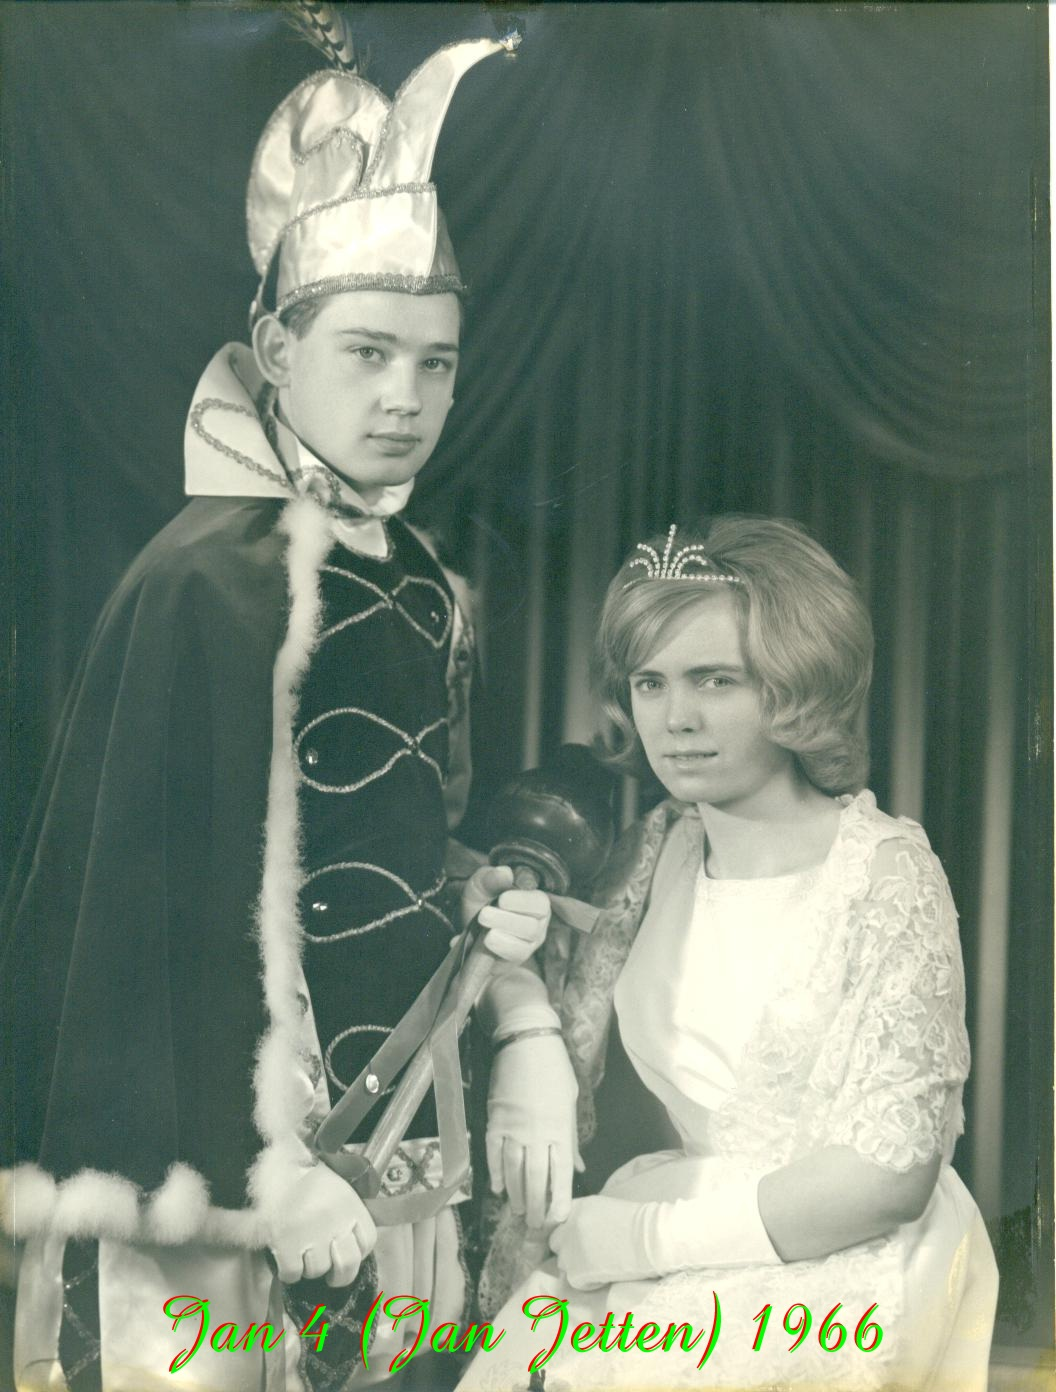 1966 Prins Jan (IV) Jetten